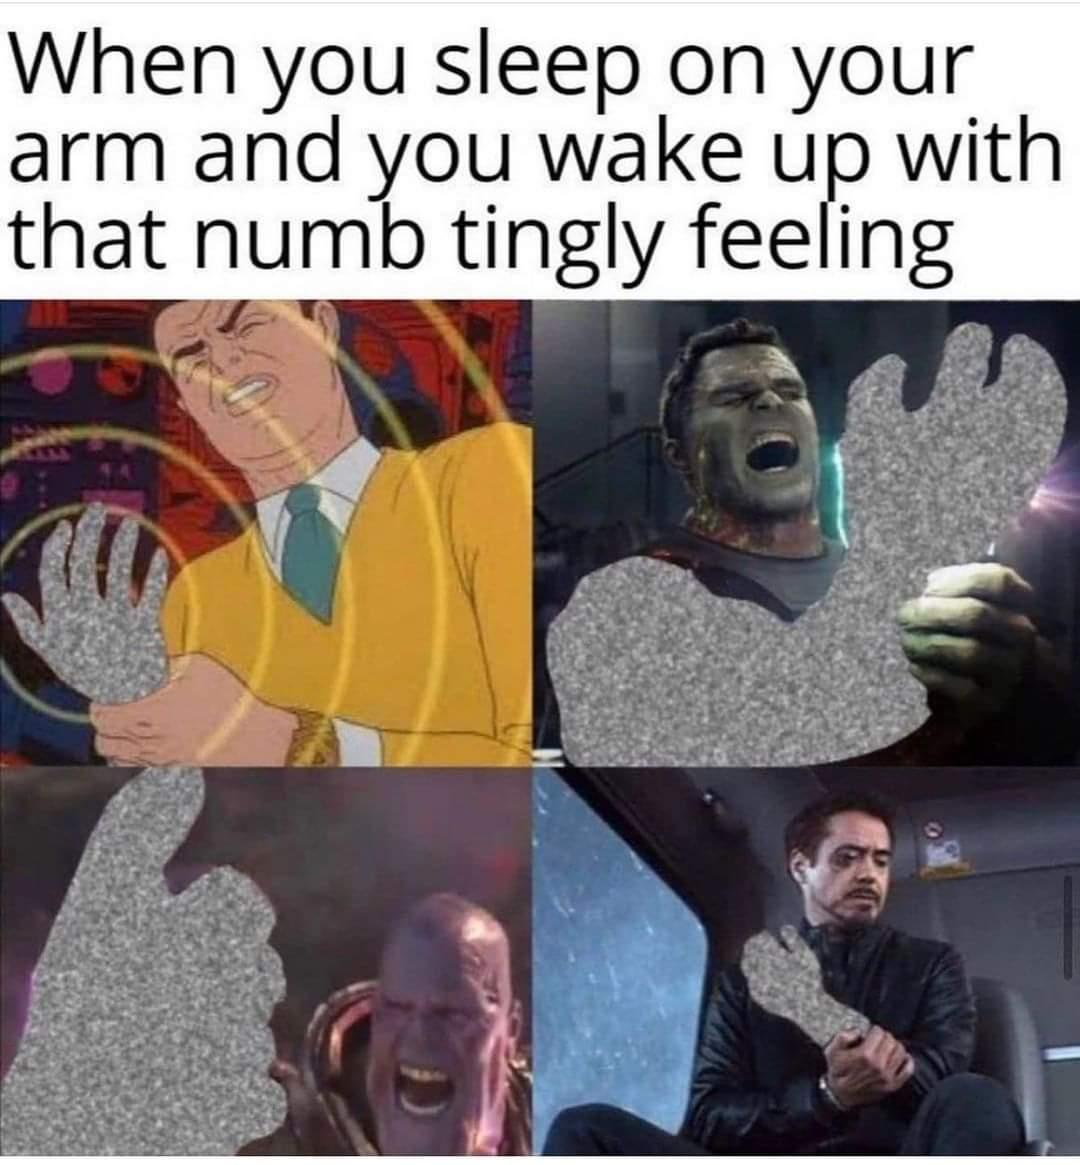 Memes When your arm falls asleep